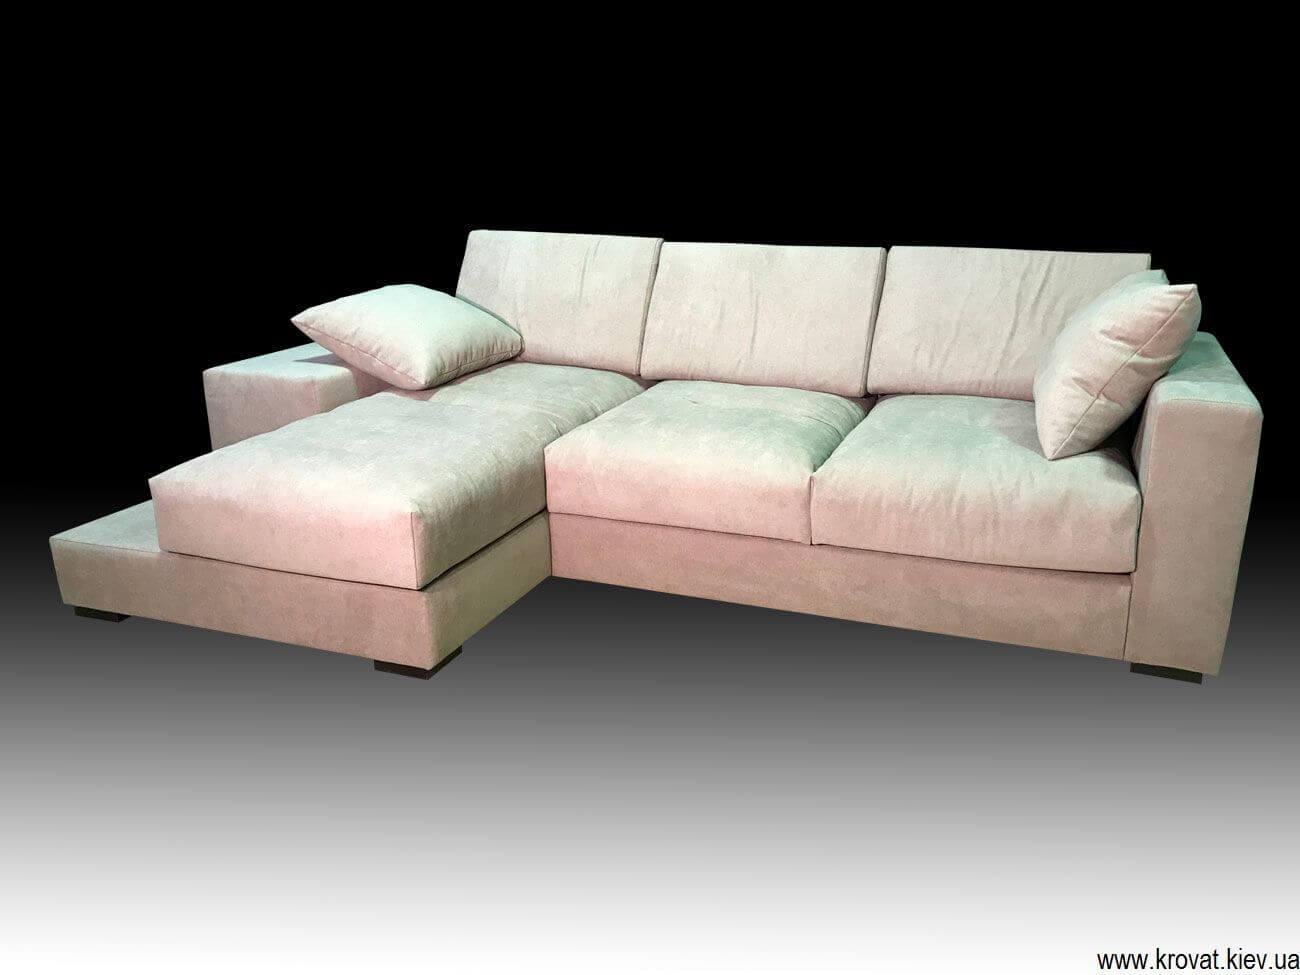 элитный мягкий диван на заказ